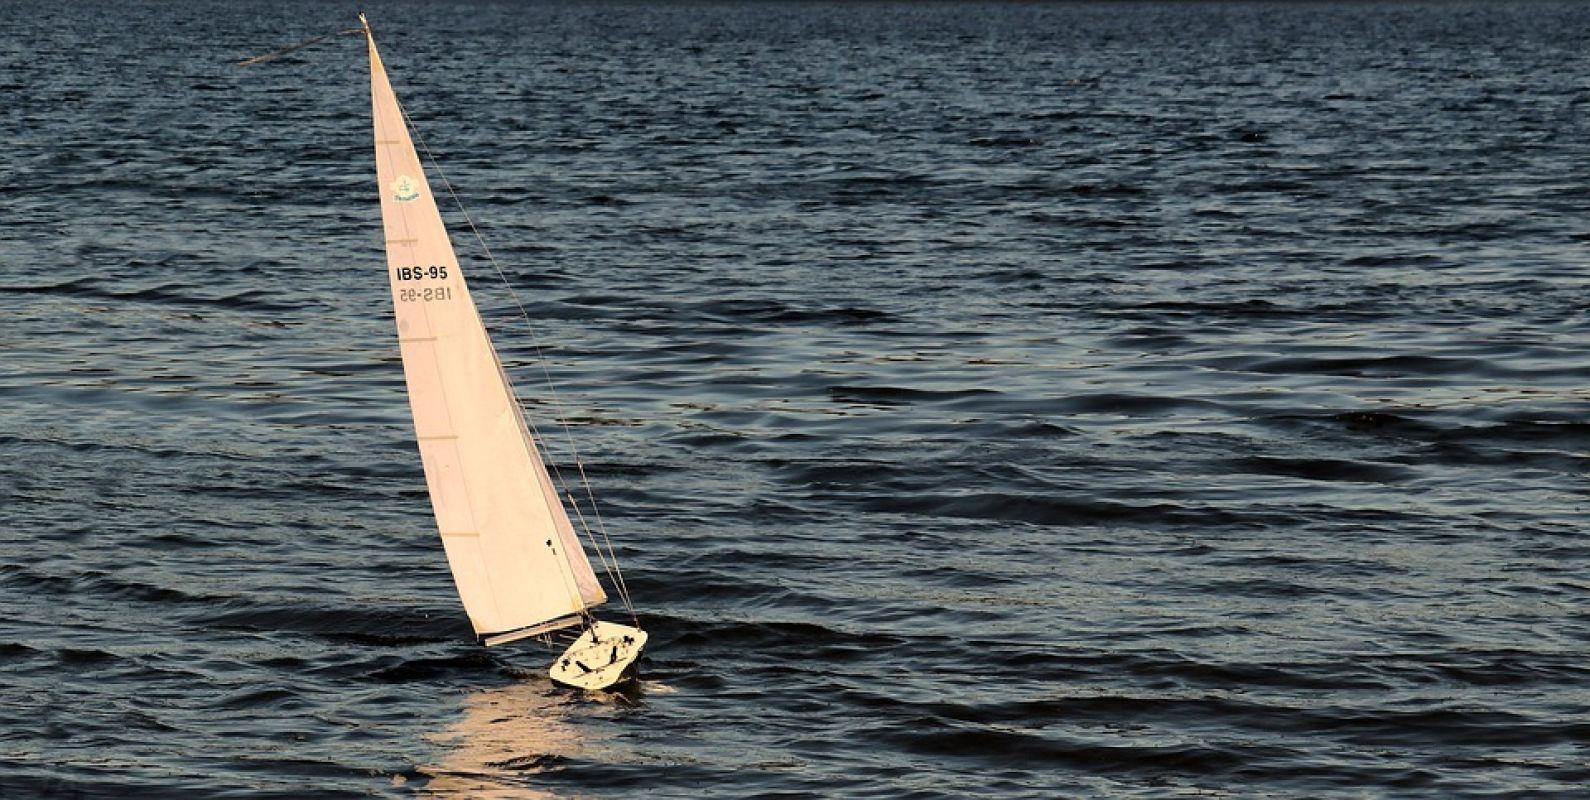 sailing-boat-3399011_960_720.jpg